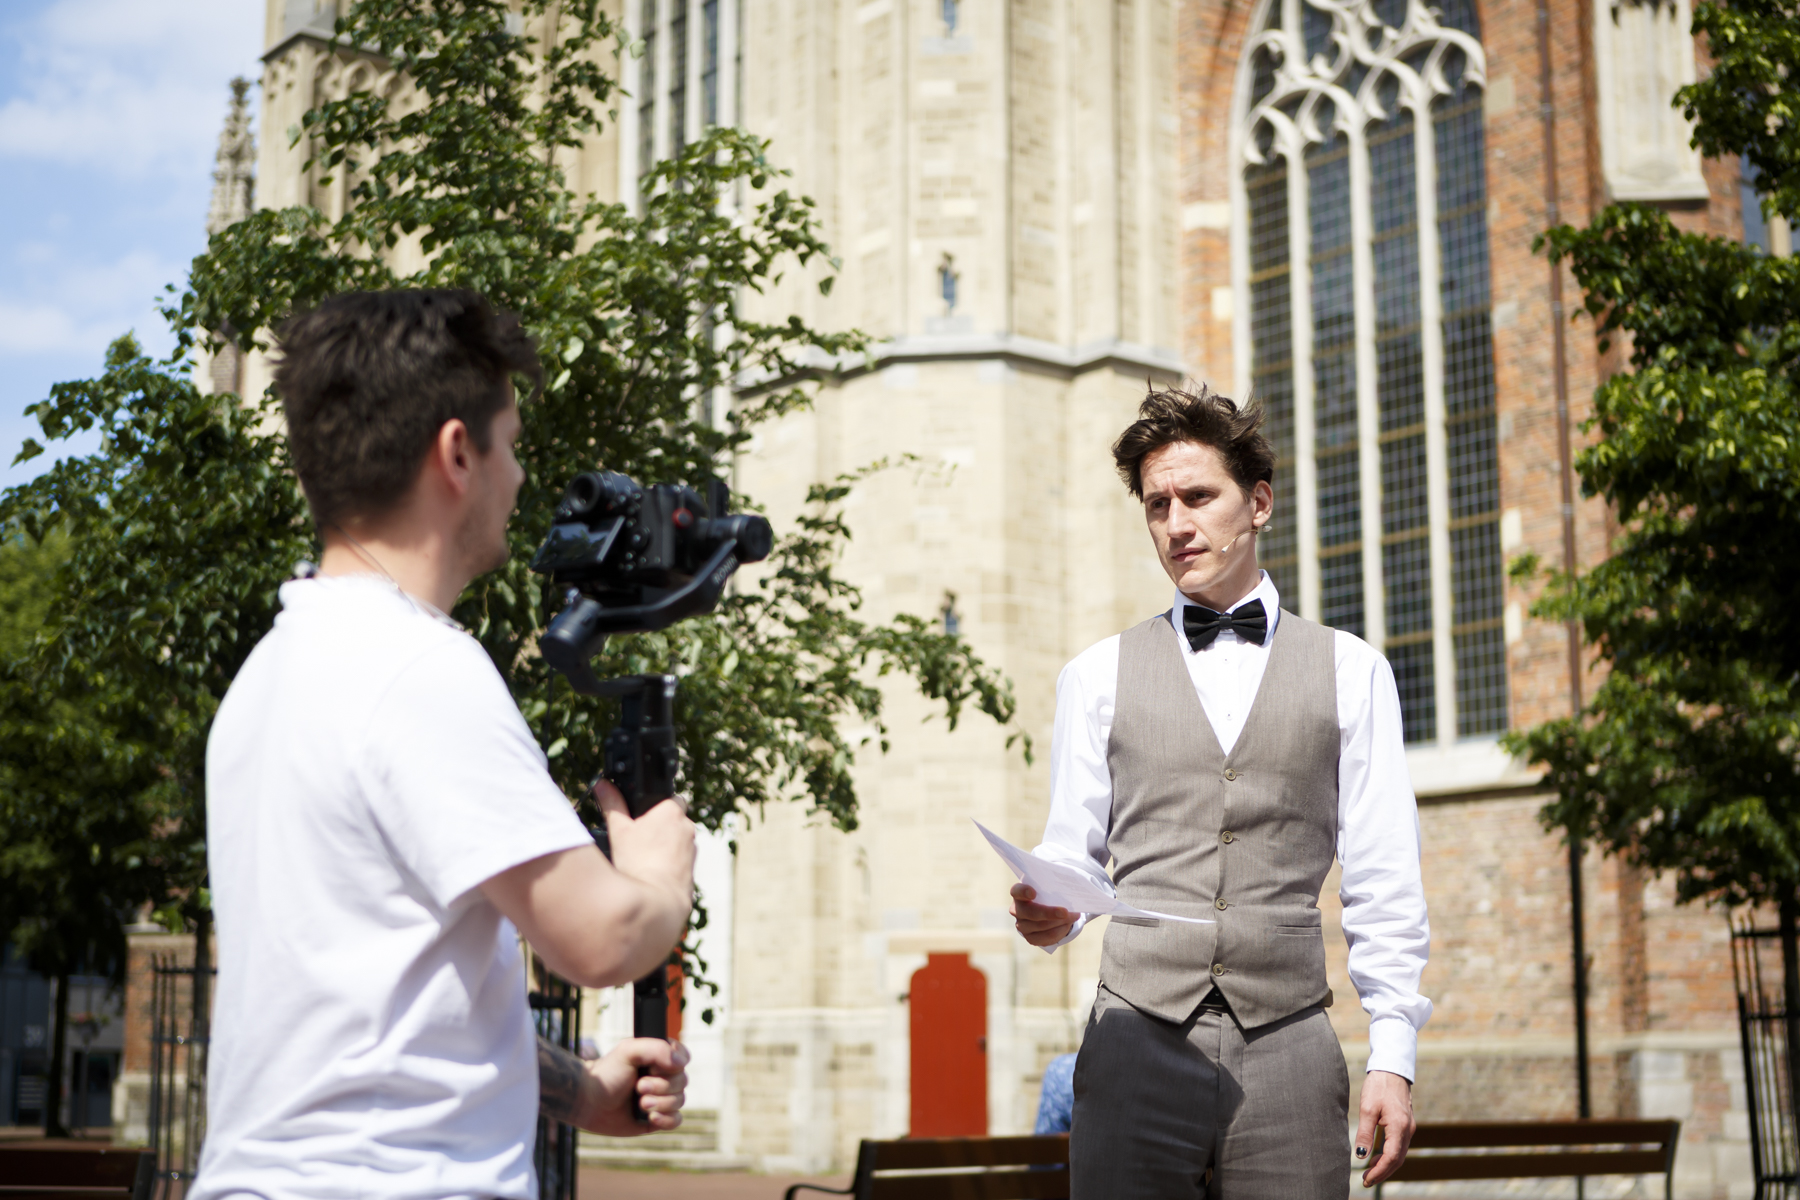 Stadsdichter, dichter Arnhem, Jesse Laport 2021, spoken word